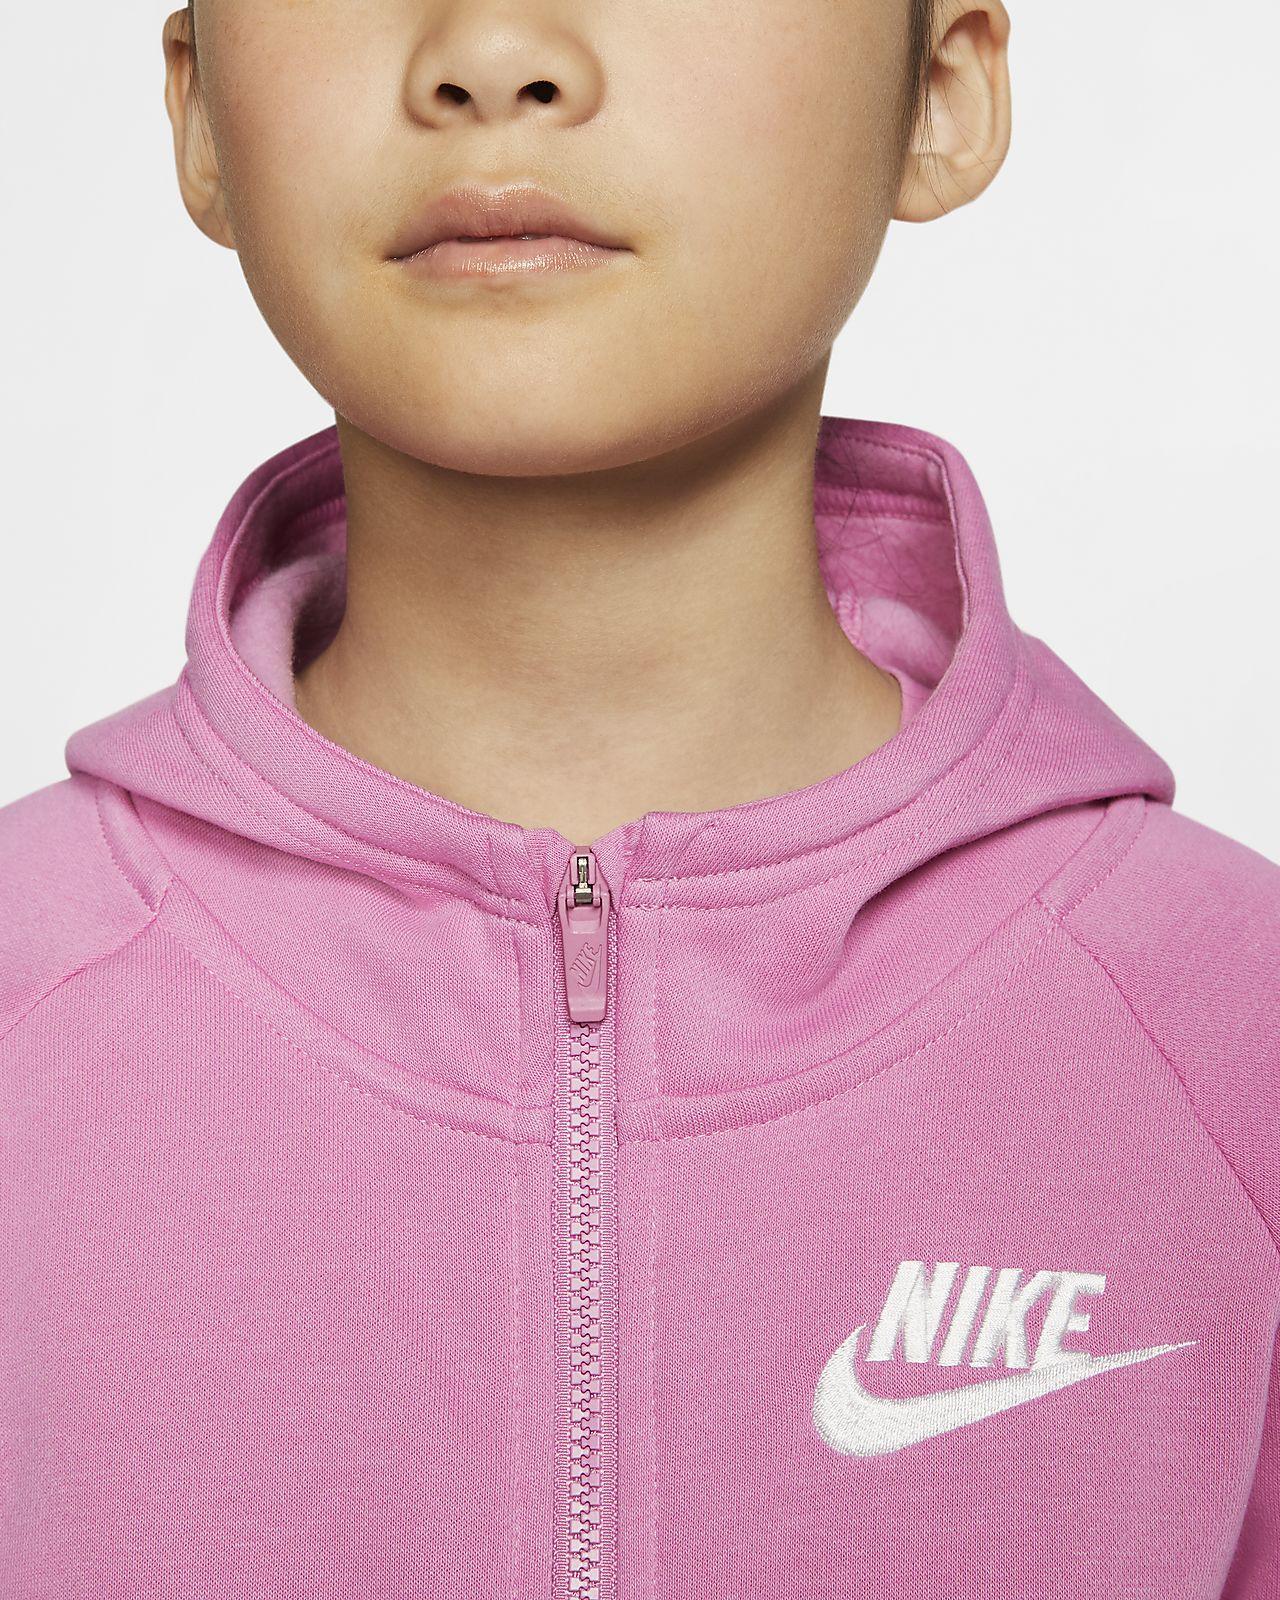 Nike M NSW Nsp TRK Pant Pantalon Homme, Jaune OcreBlanc, XS